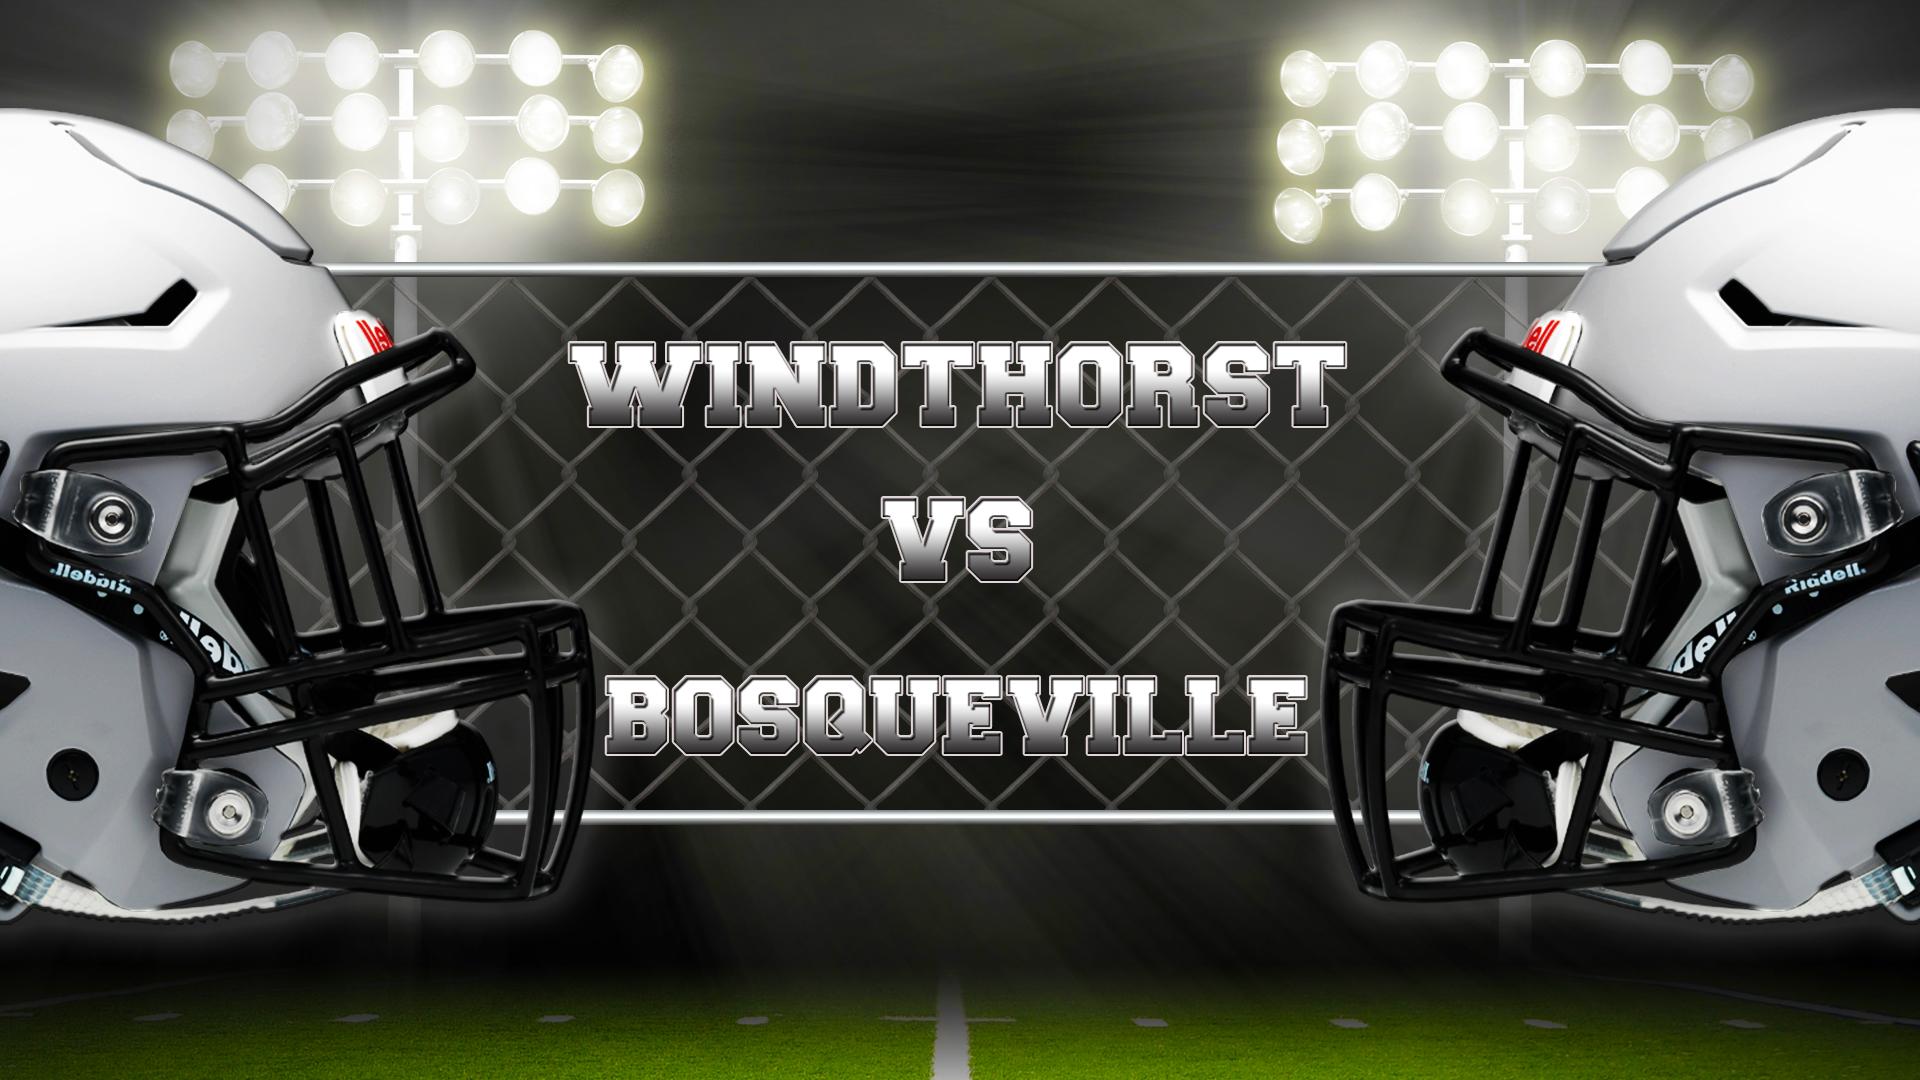 Windthorst vs Bosqueville_1479514011466.jpg